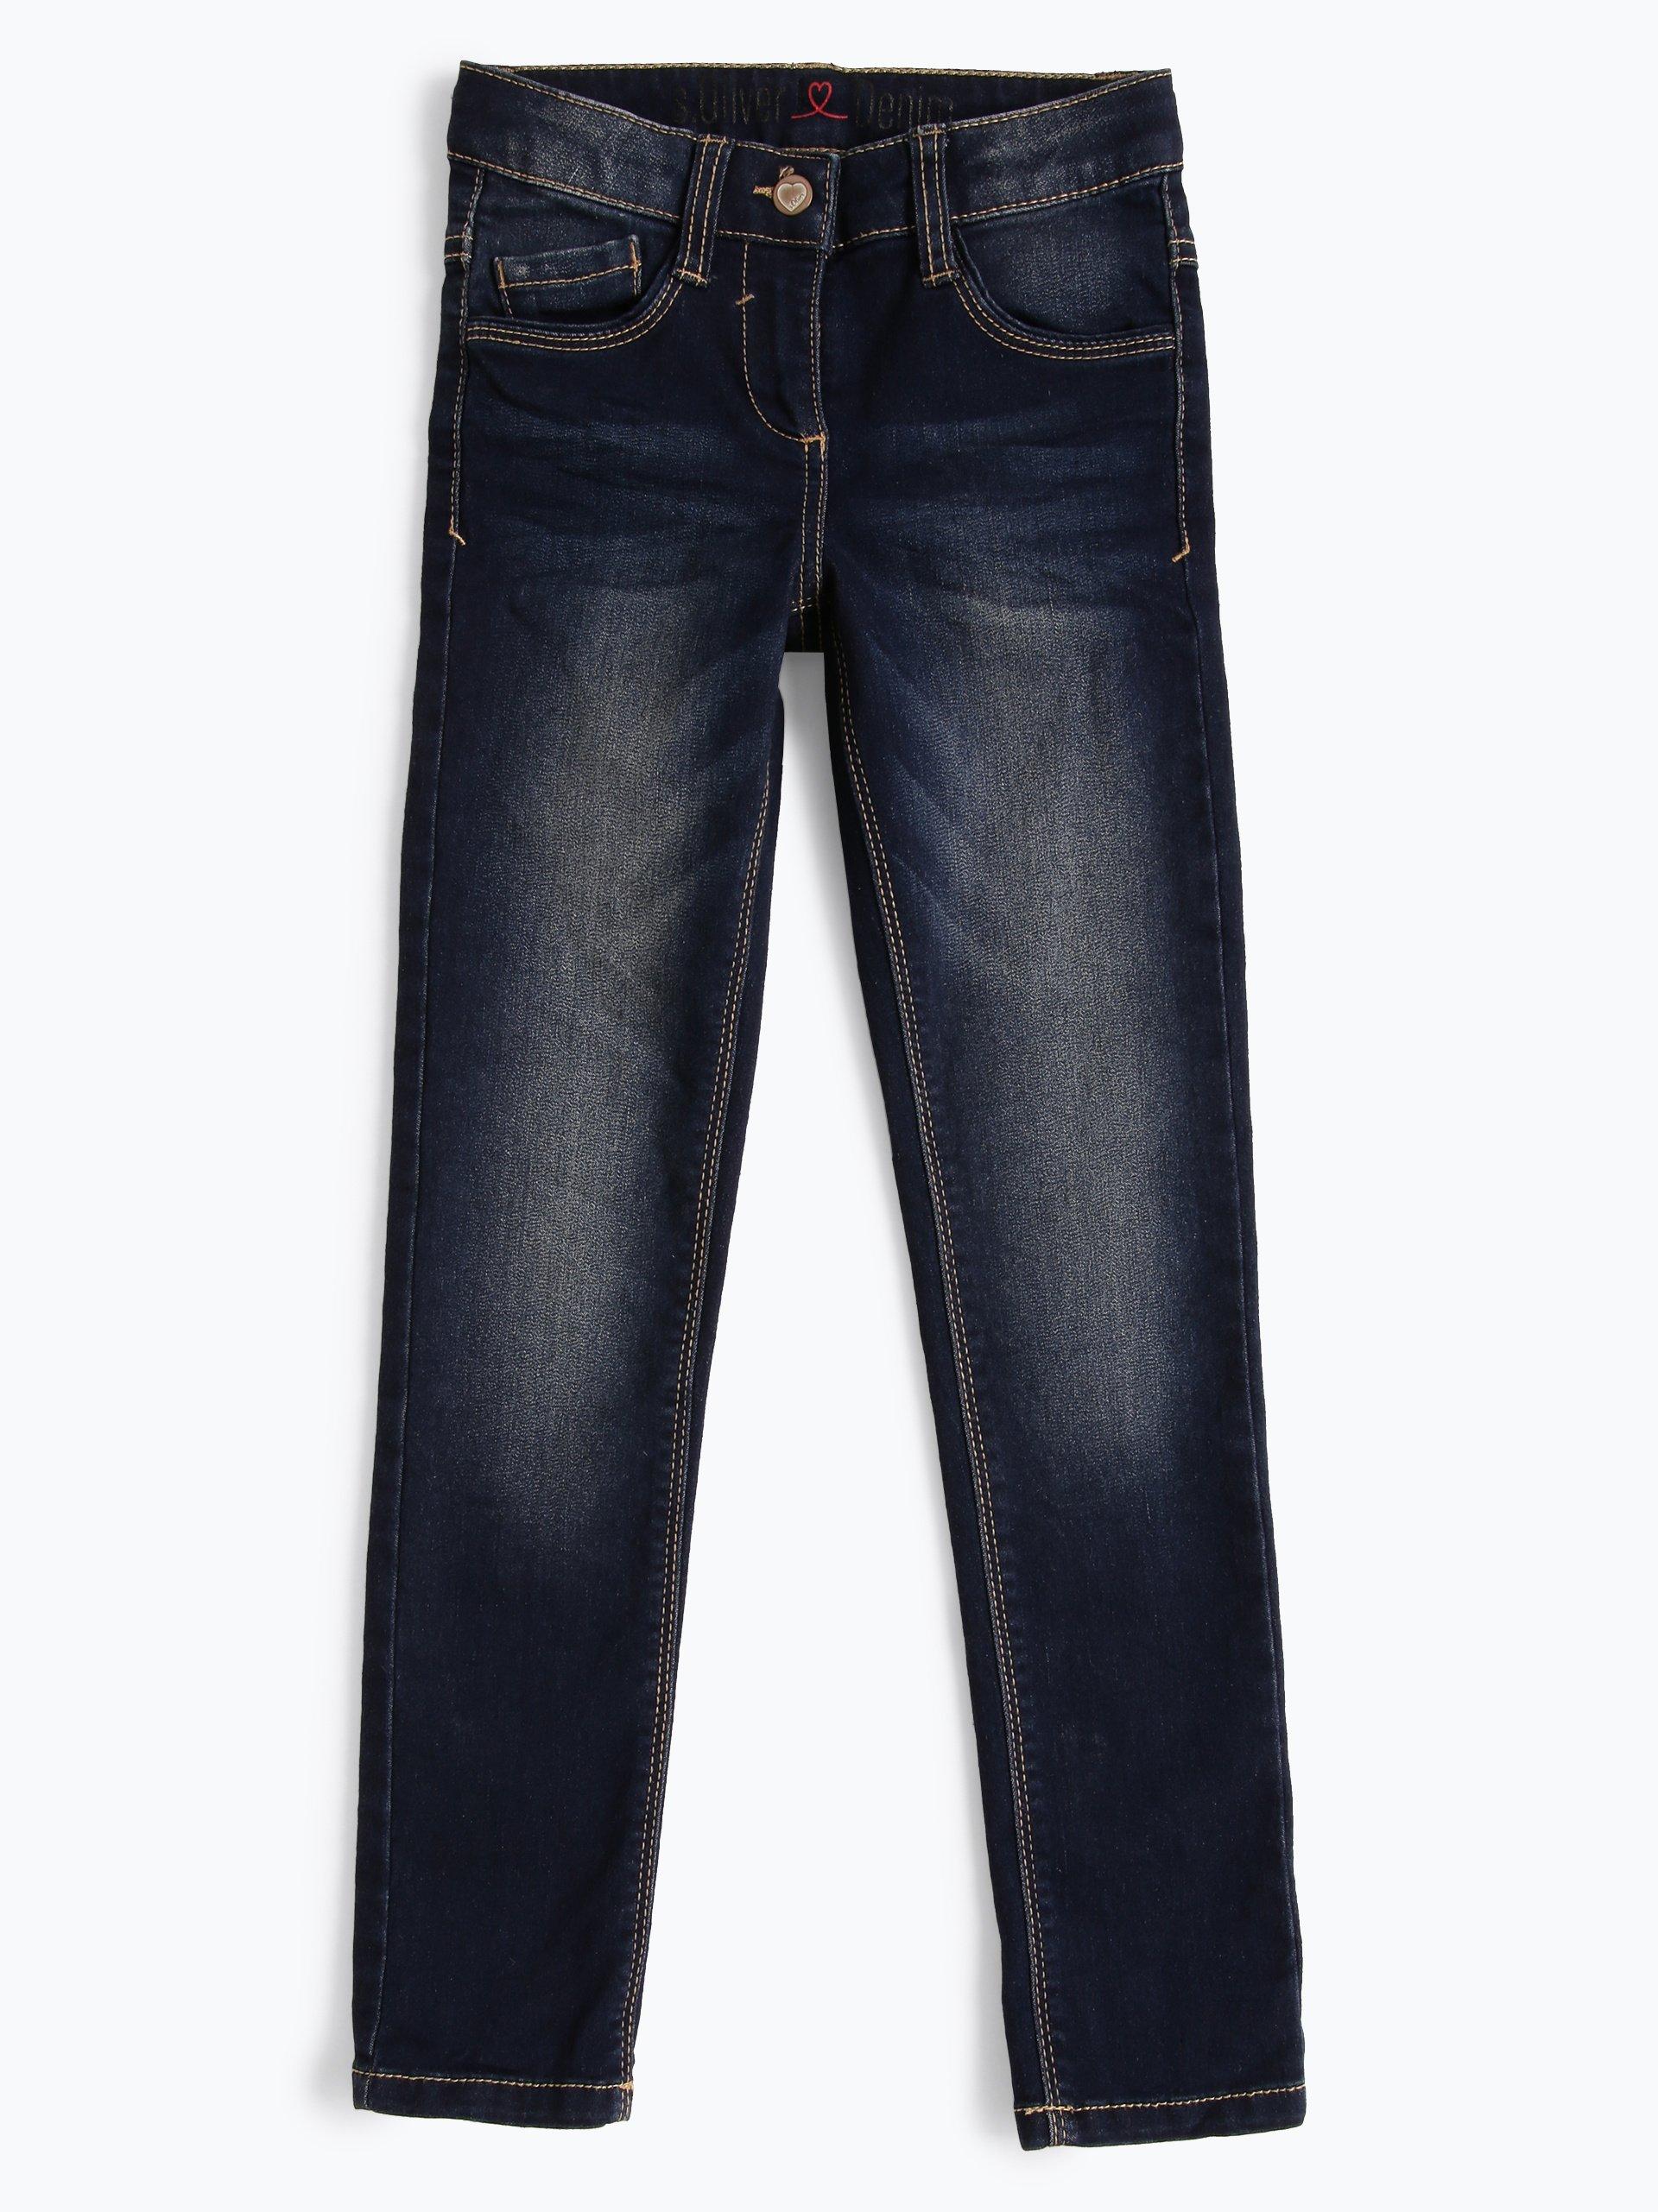 s.Oliver Casual Mädchen Jeans Regular Fit - Kathy